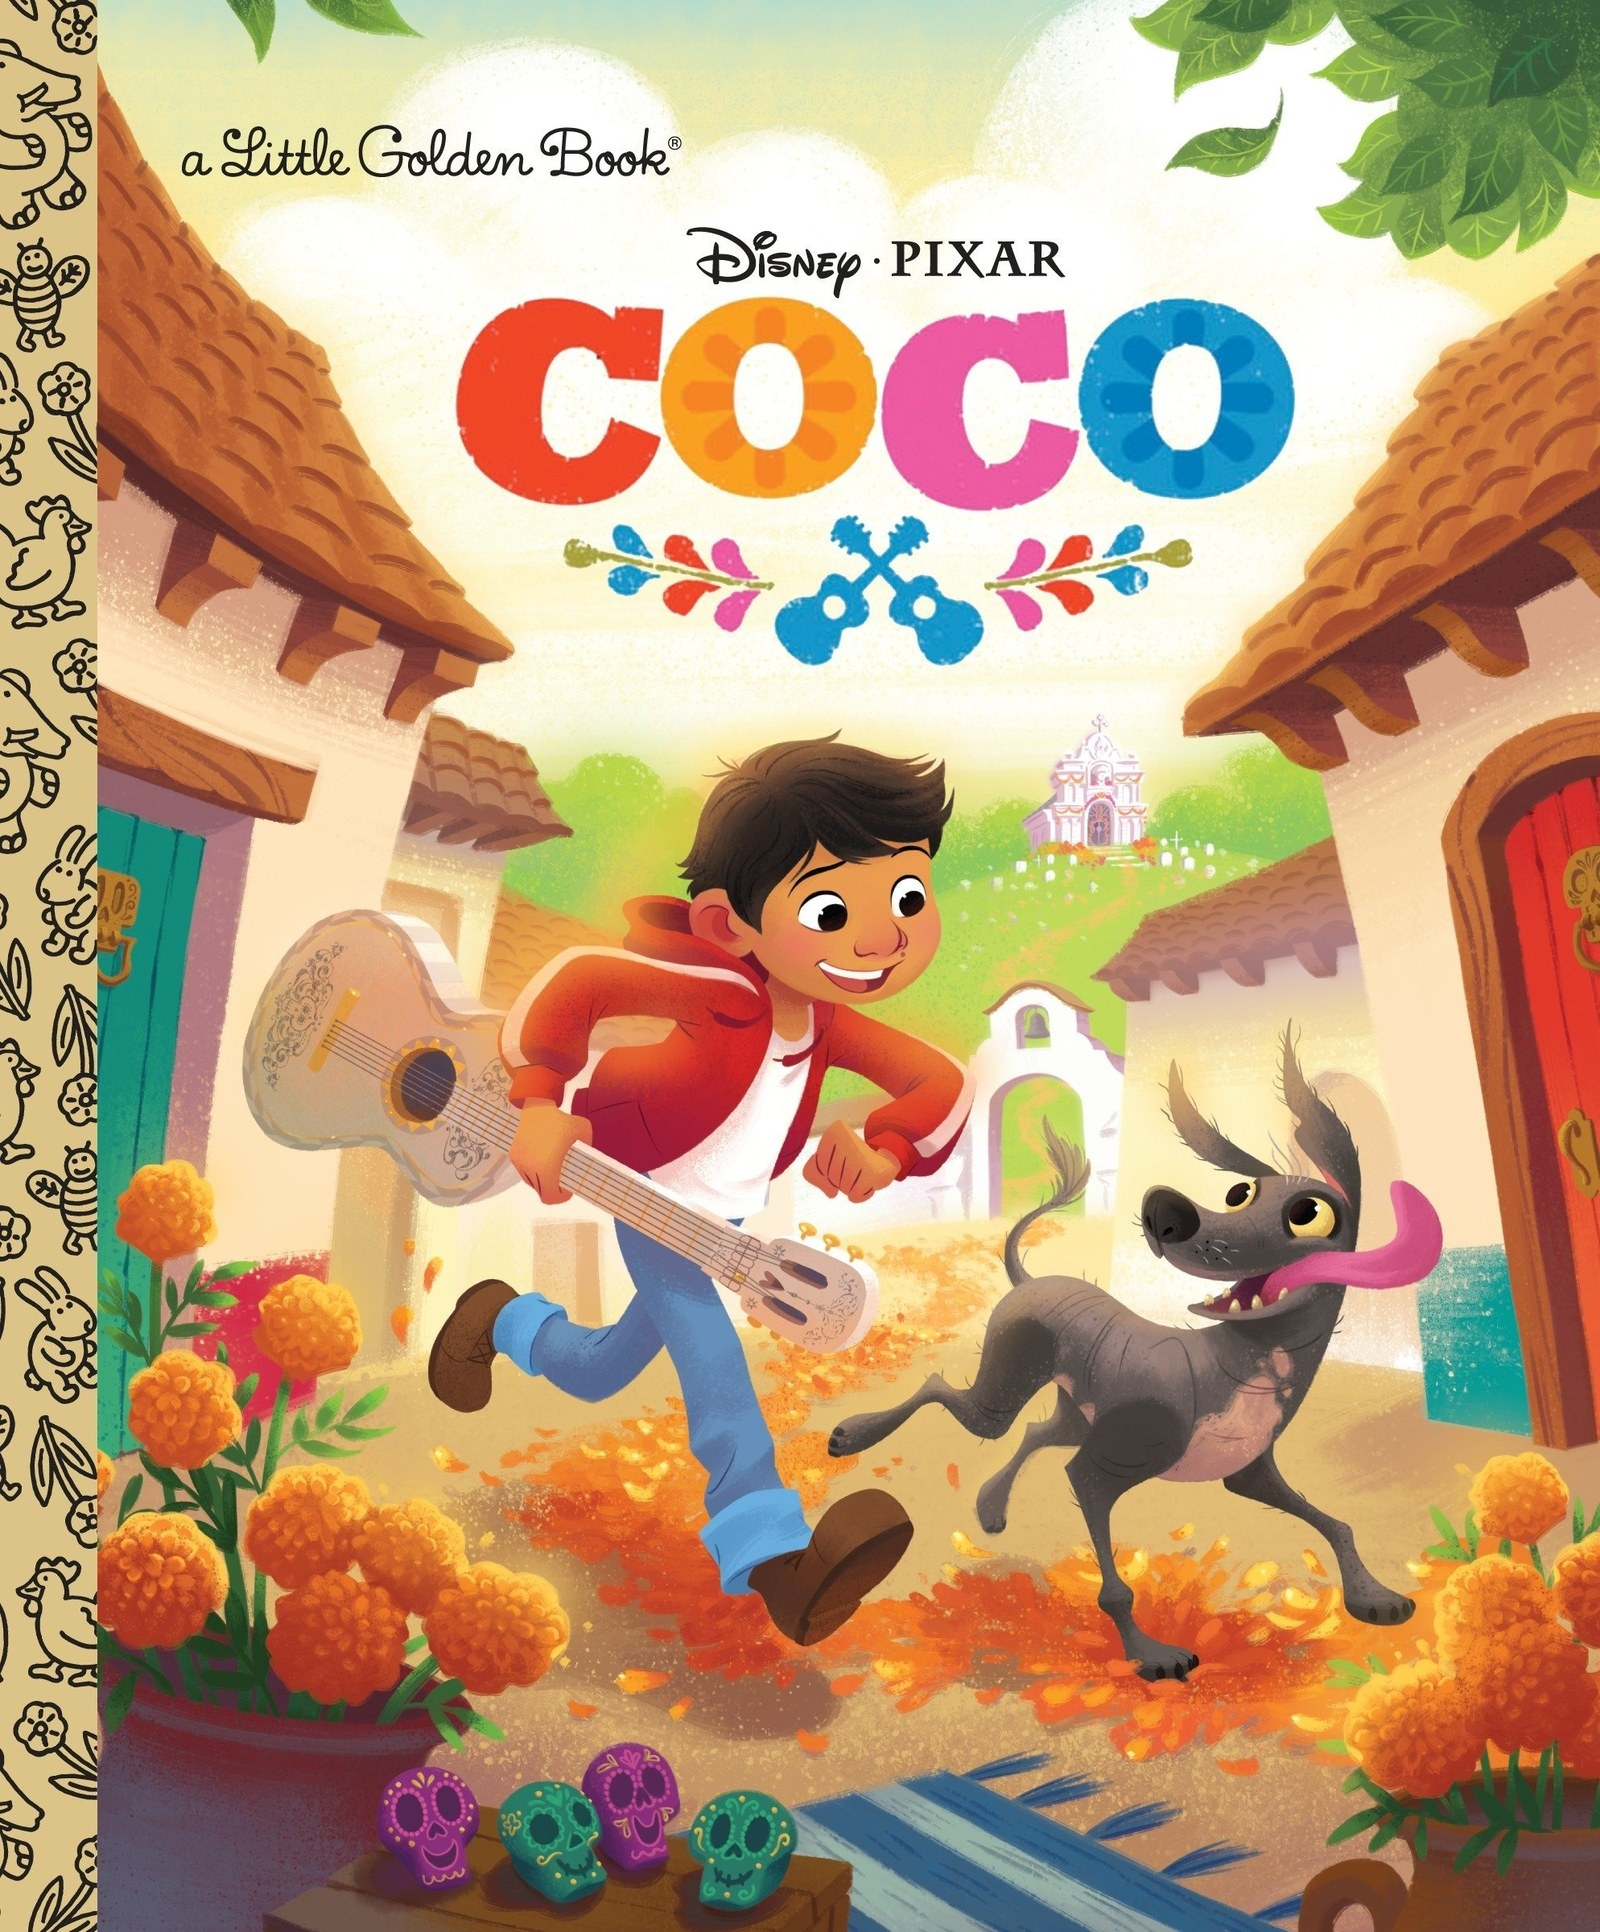 A Little Golden Book of Disney Pixar's Coco